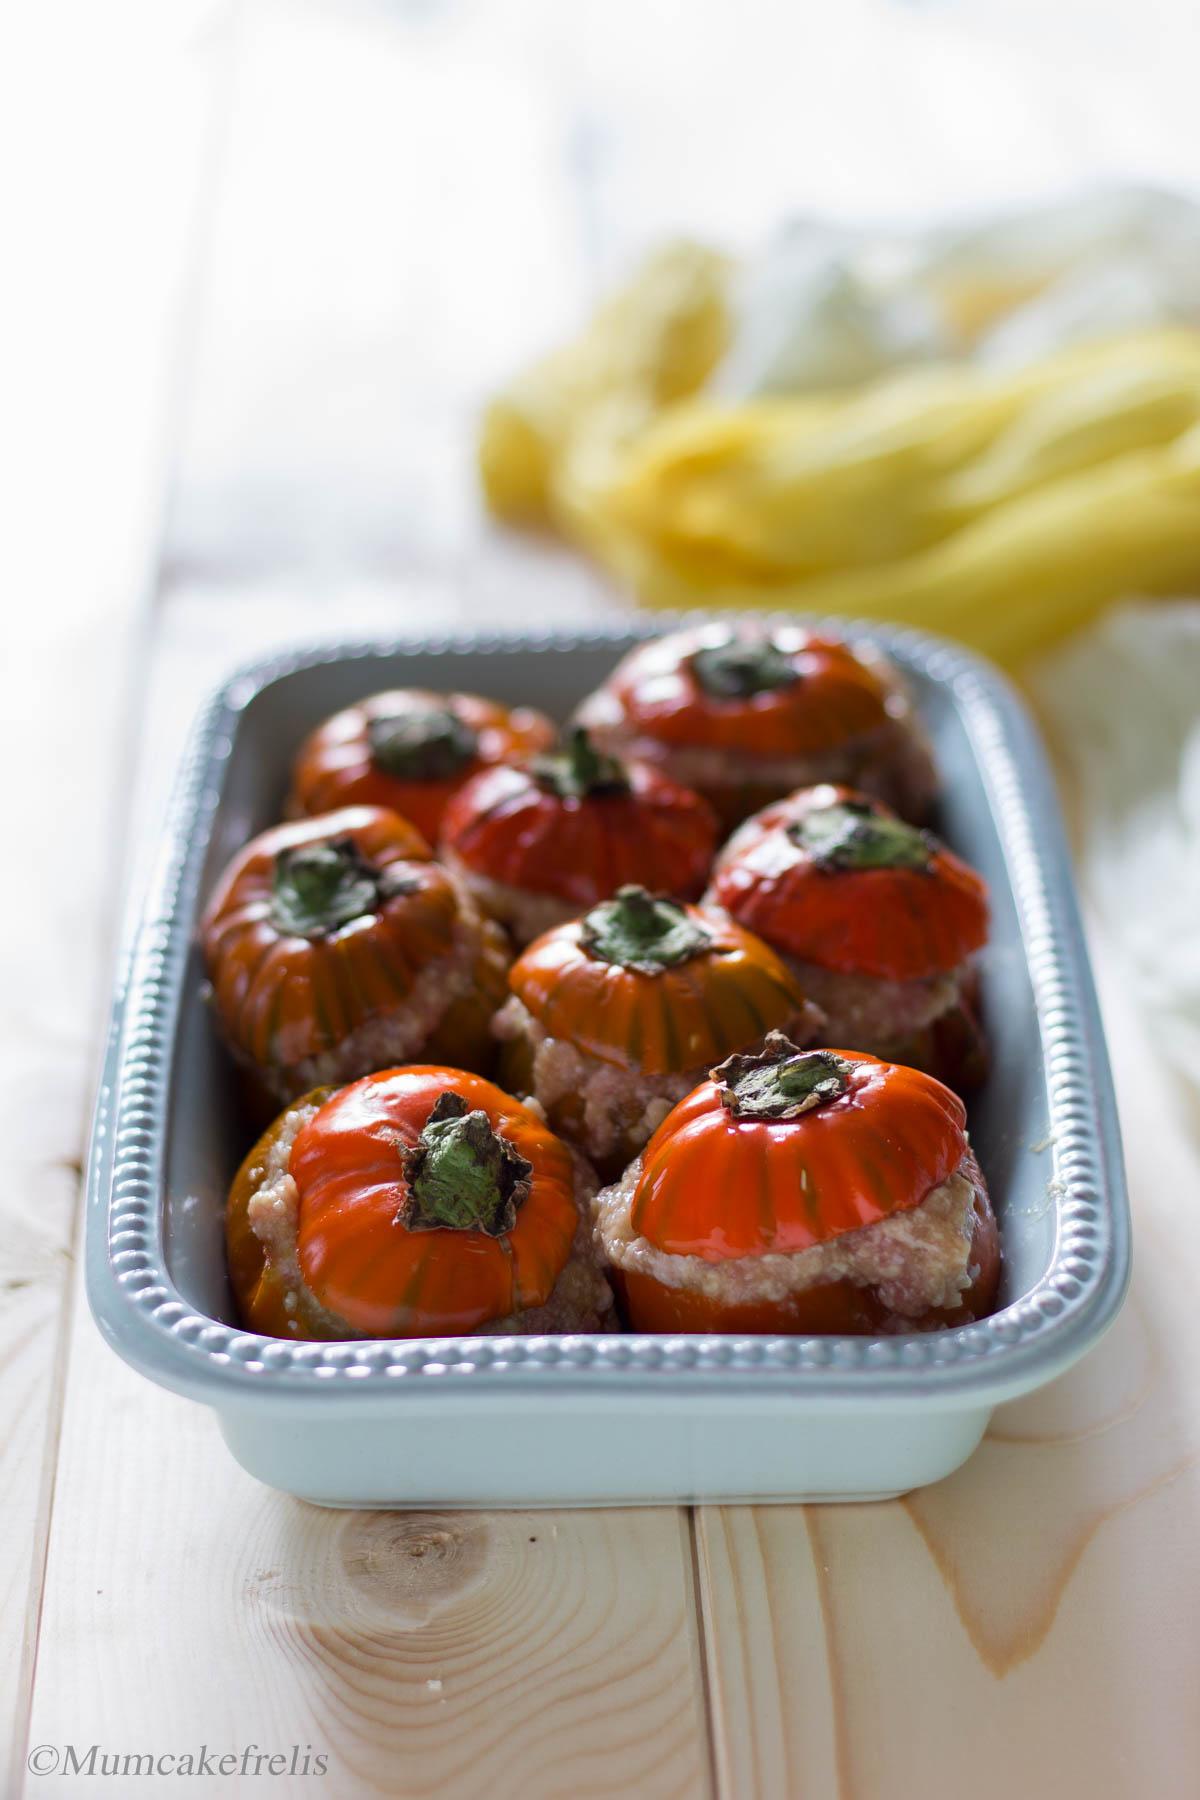 melanzana rossa di rotonda dop ricette, melanzana rossa di rotonda presidio slow food